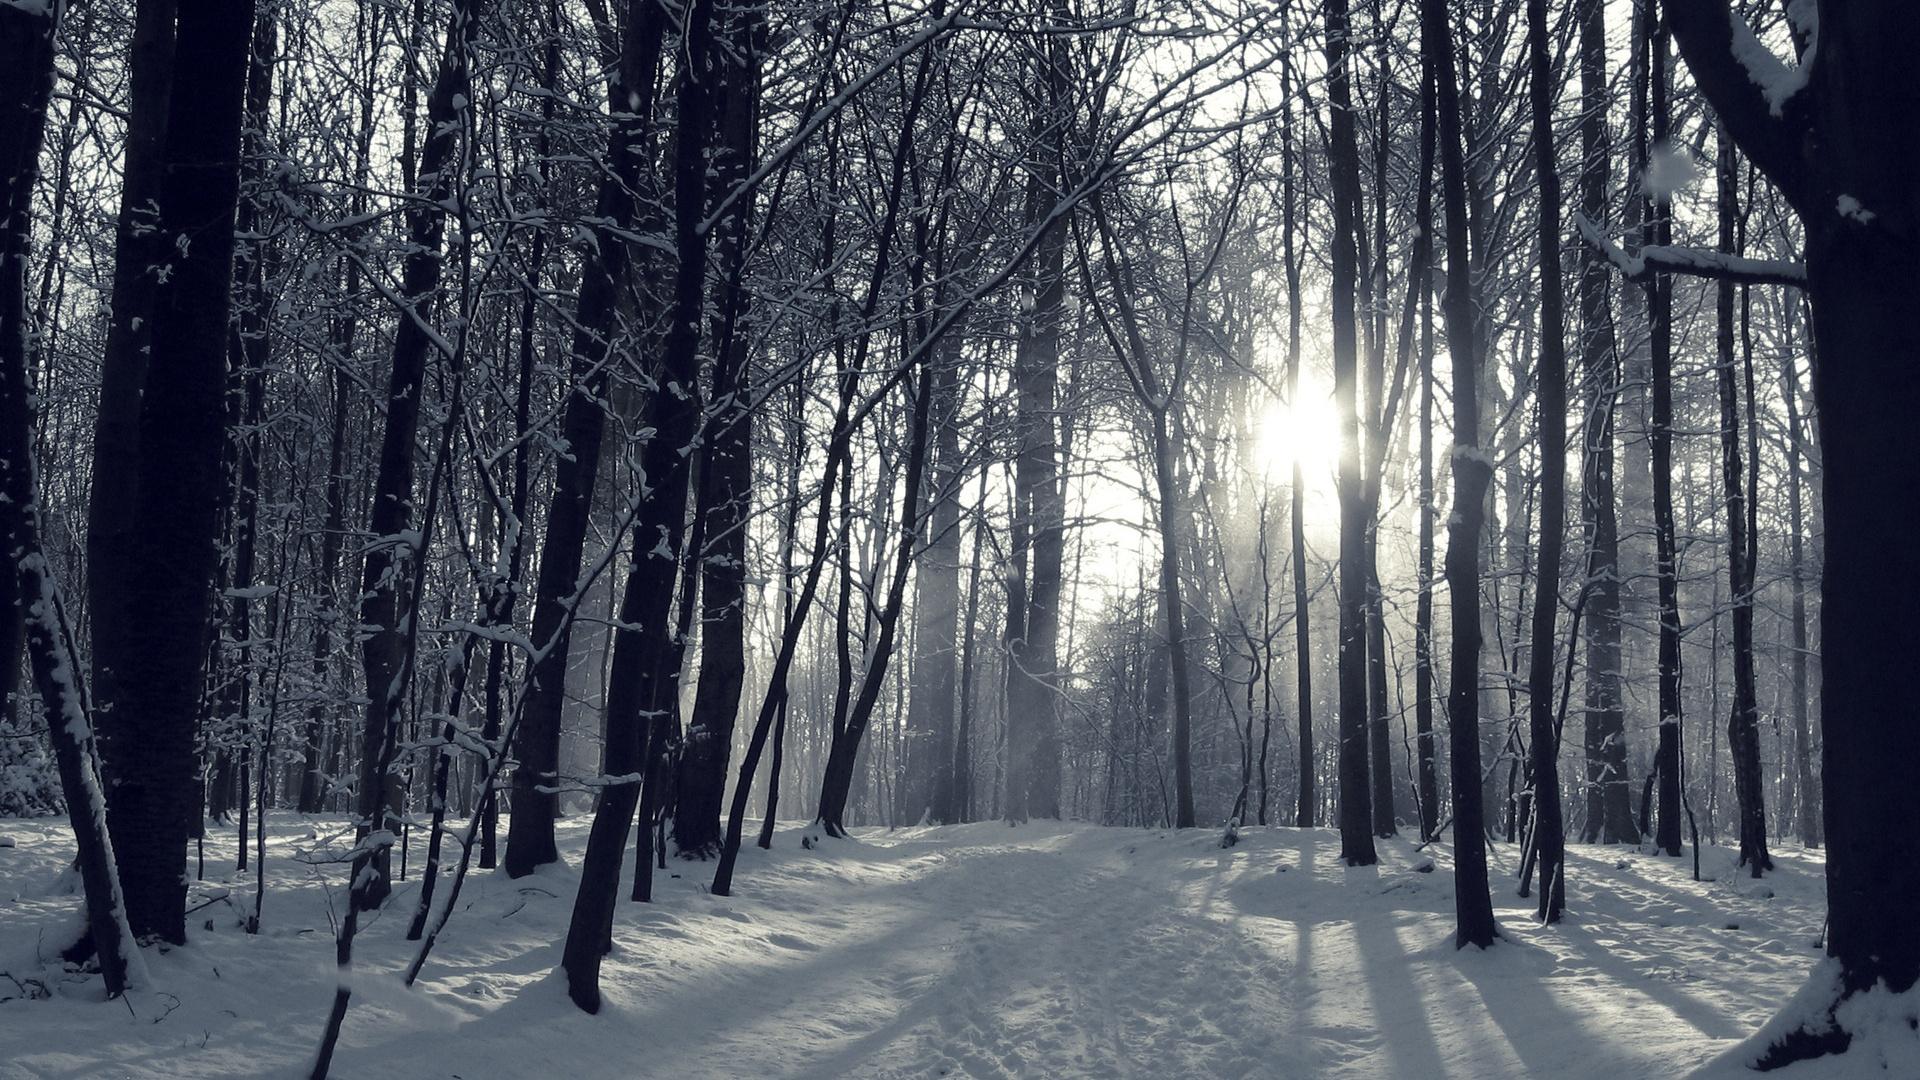 Winter Forest Wallpaper Wallpapersafari